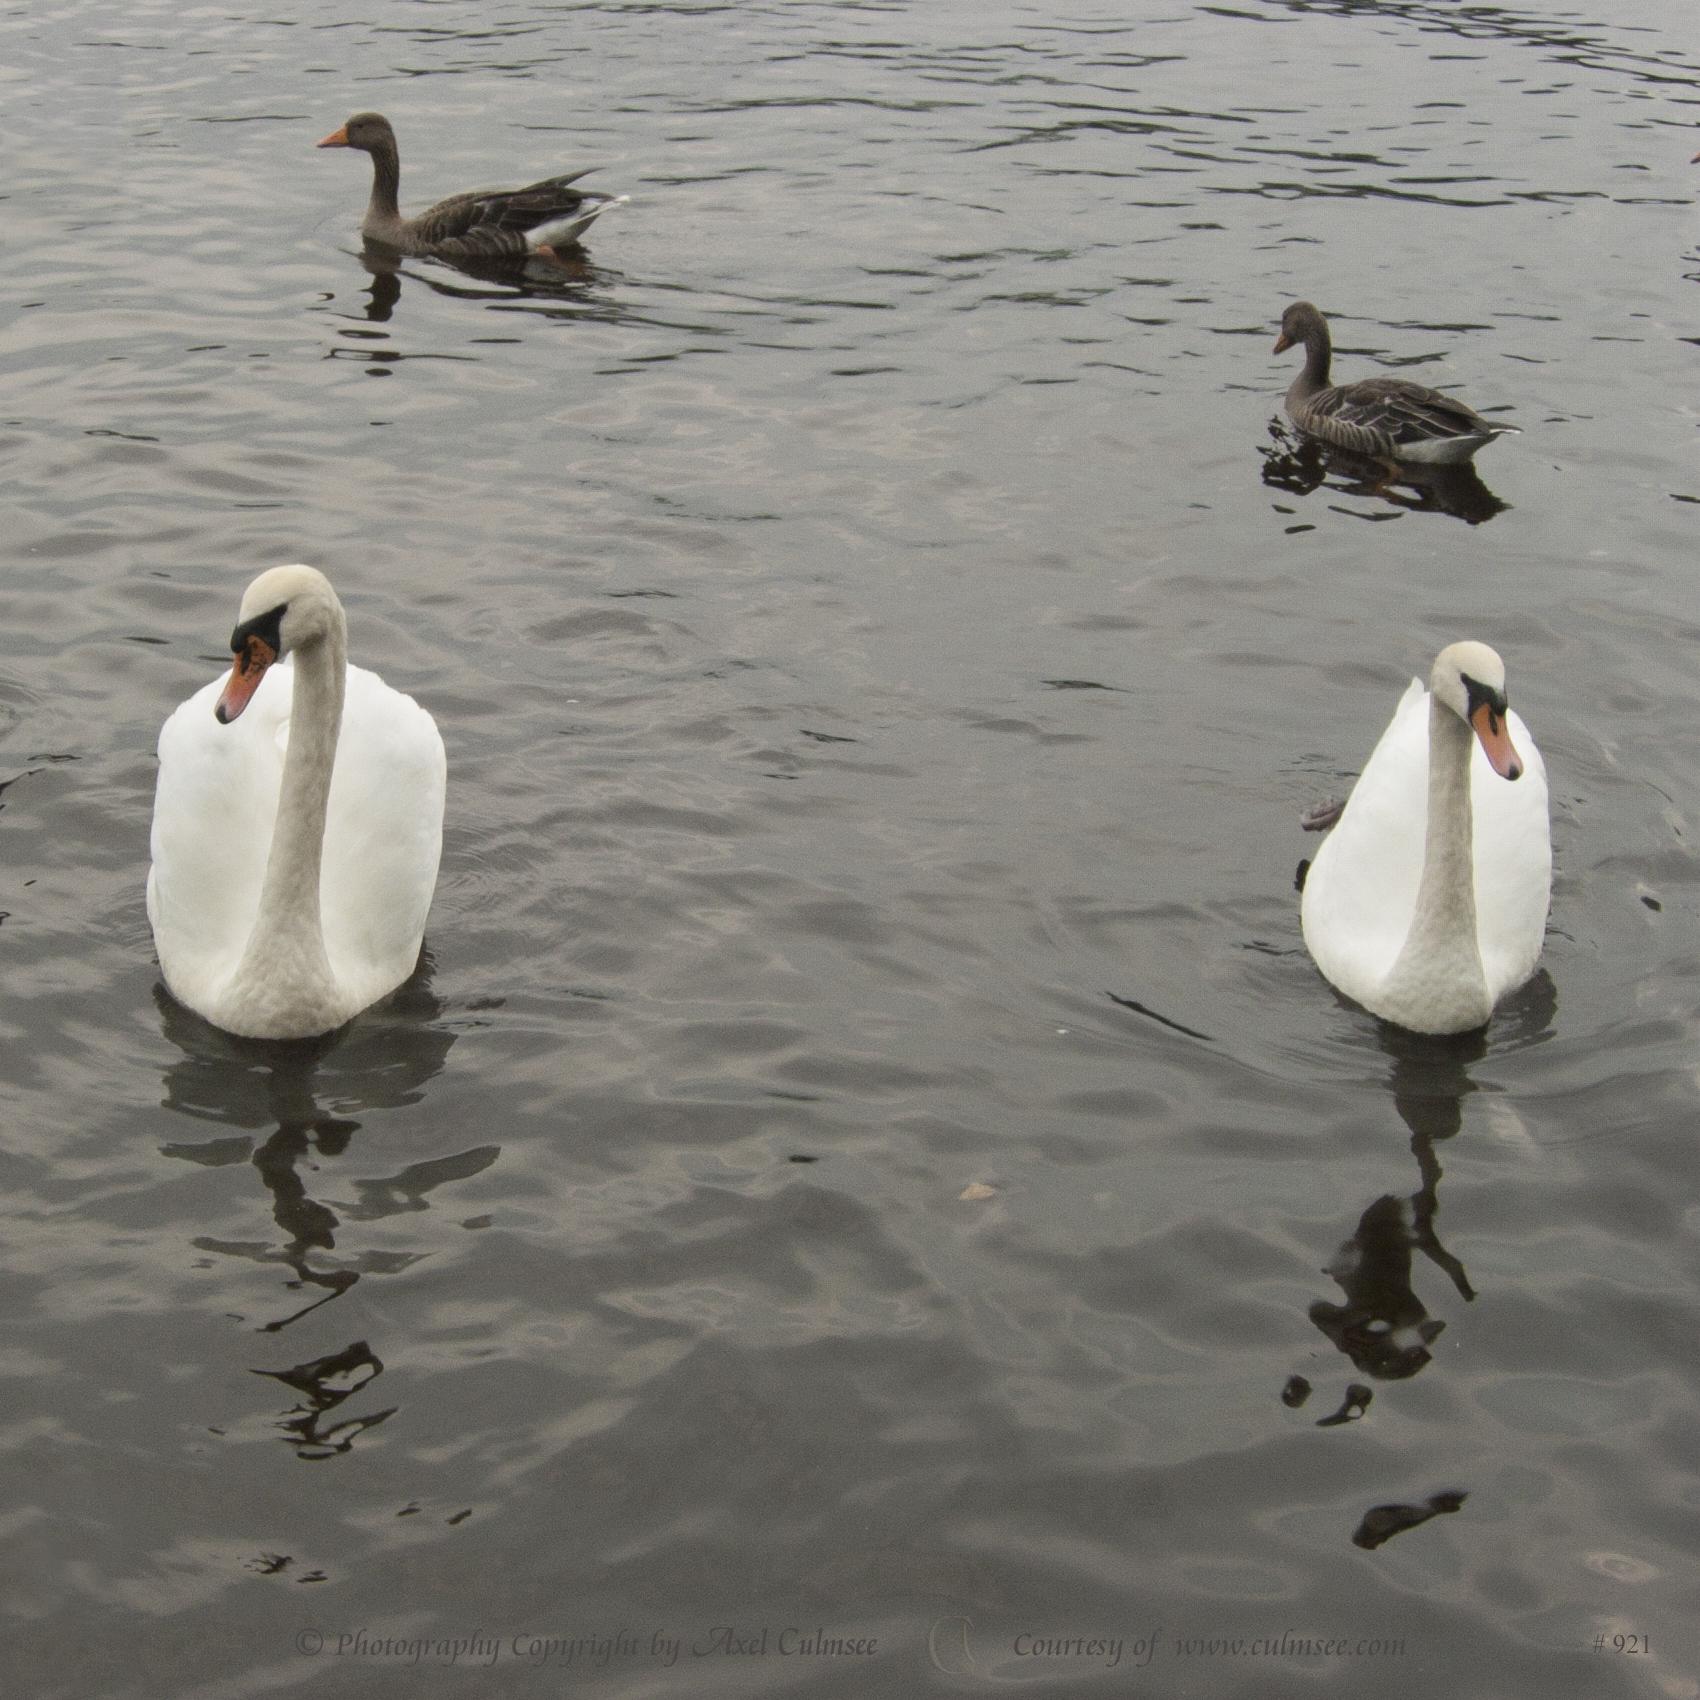 Greylag goose, Graugans, Anser anser L. and Mute swan